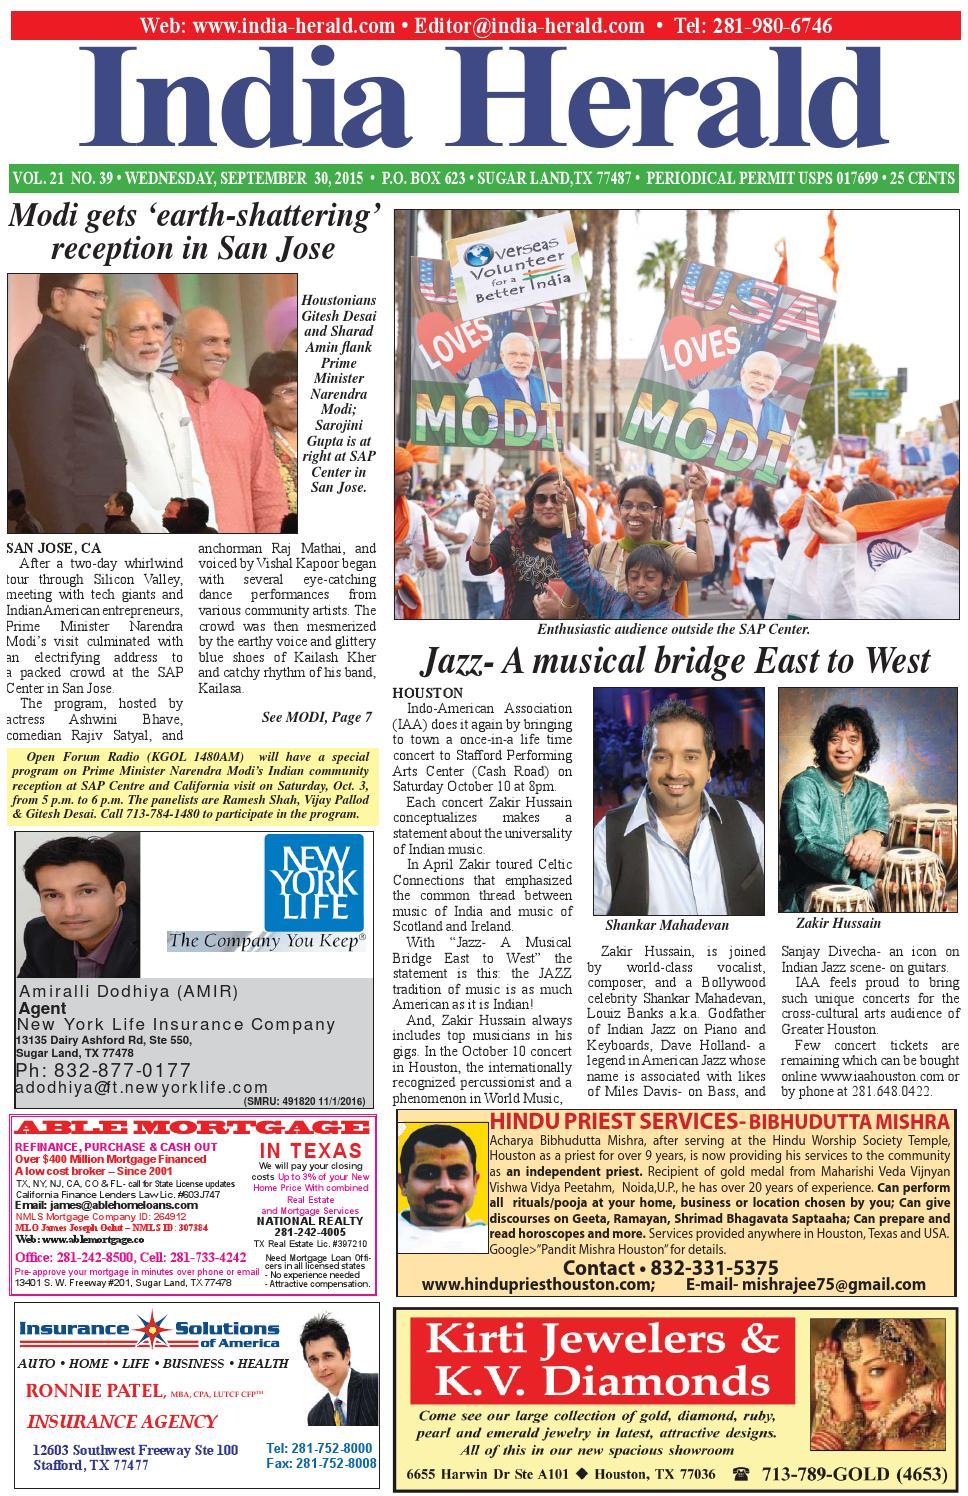 Indiaherald 093015 By India Herald Issuu